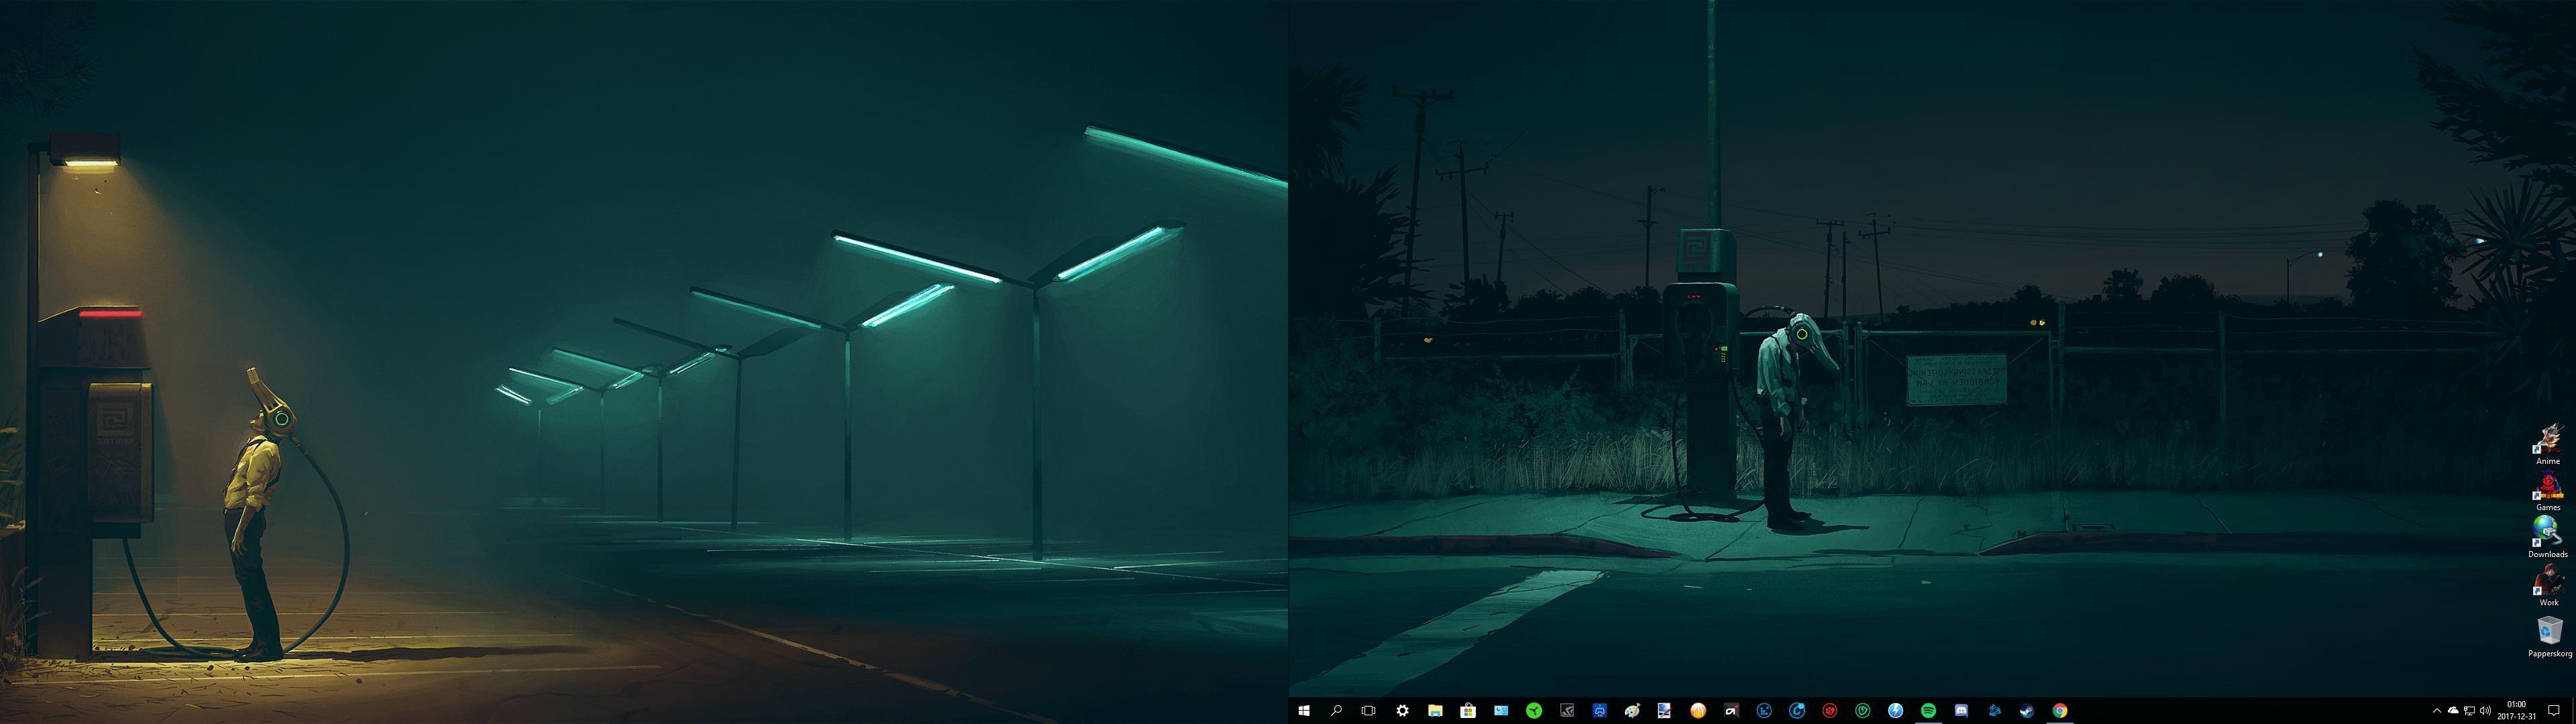 Minimalist Dual Monitor Wallpaper Posted By Ryan Mercado